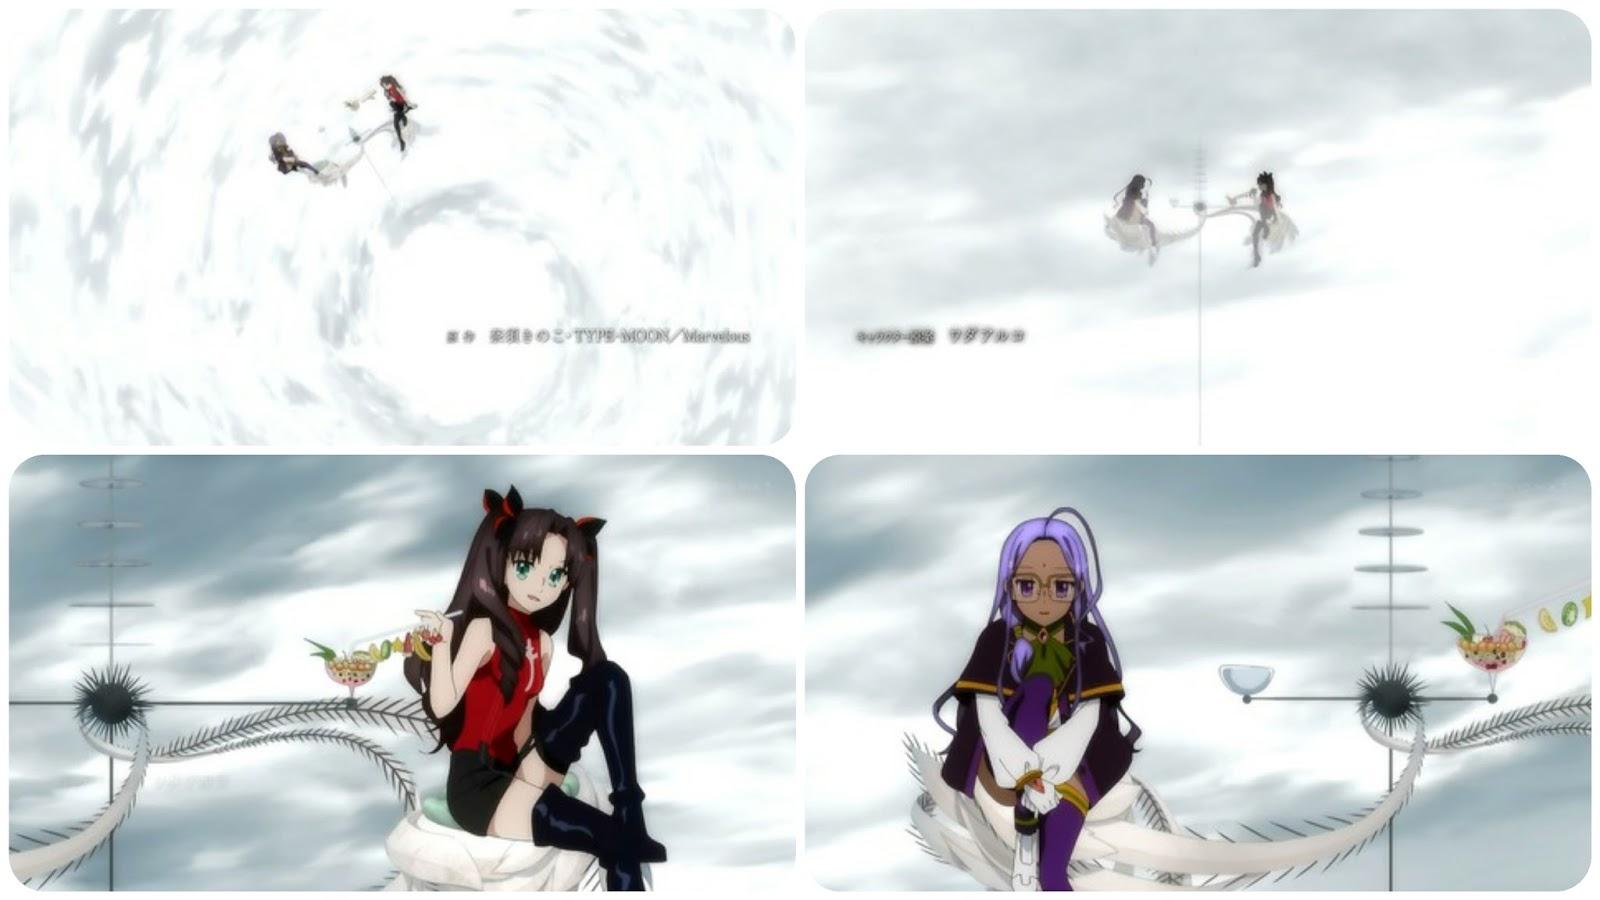 Anime Nikki: [Fate/Extra: Last Encore] Episode 10 impressions